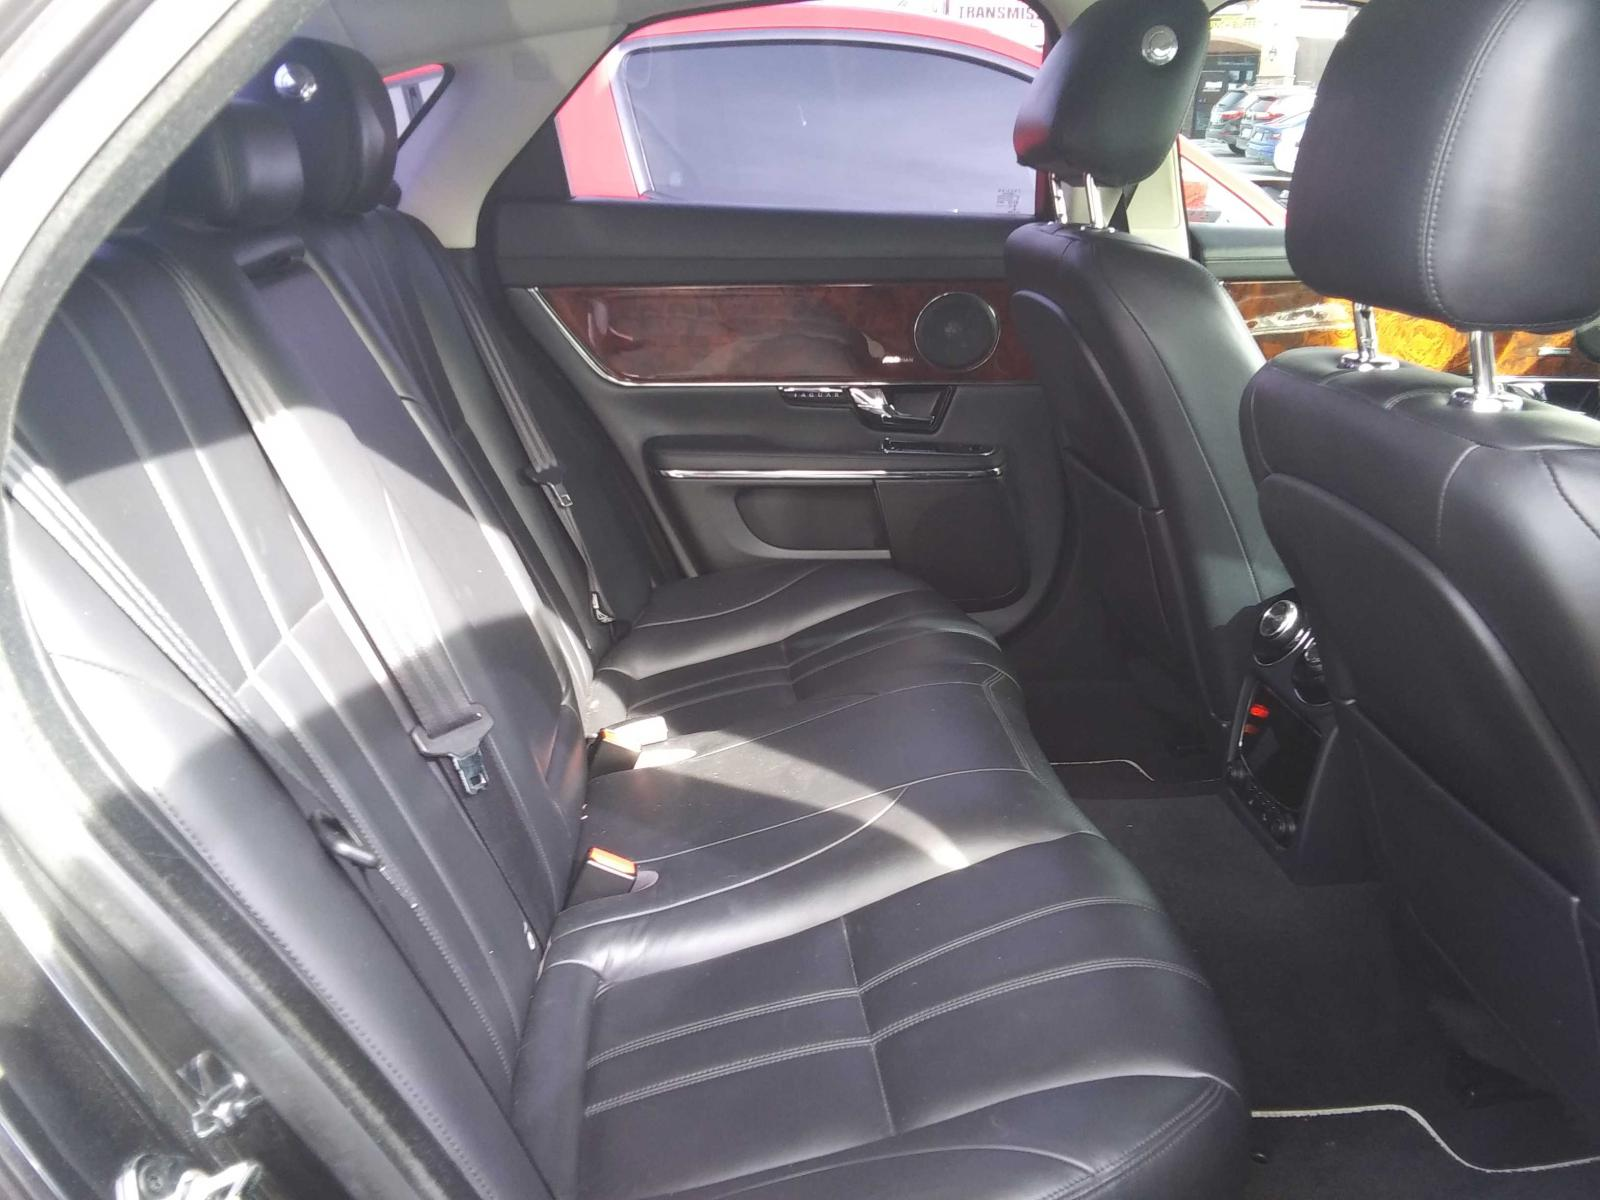 SAJWA1C79D8V42339 - 2013 Jaguar Xj 3.0L detail view